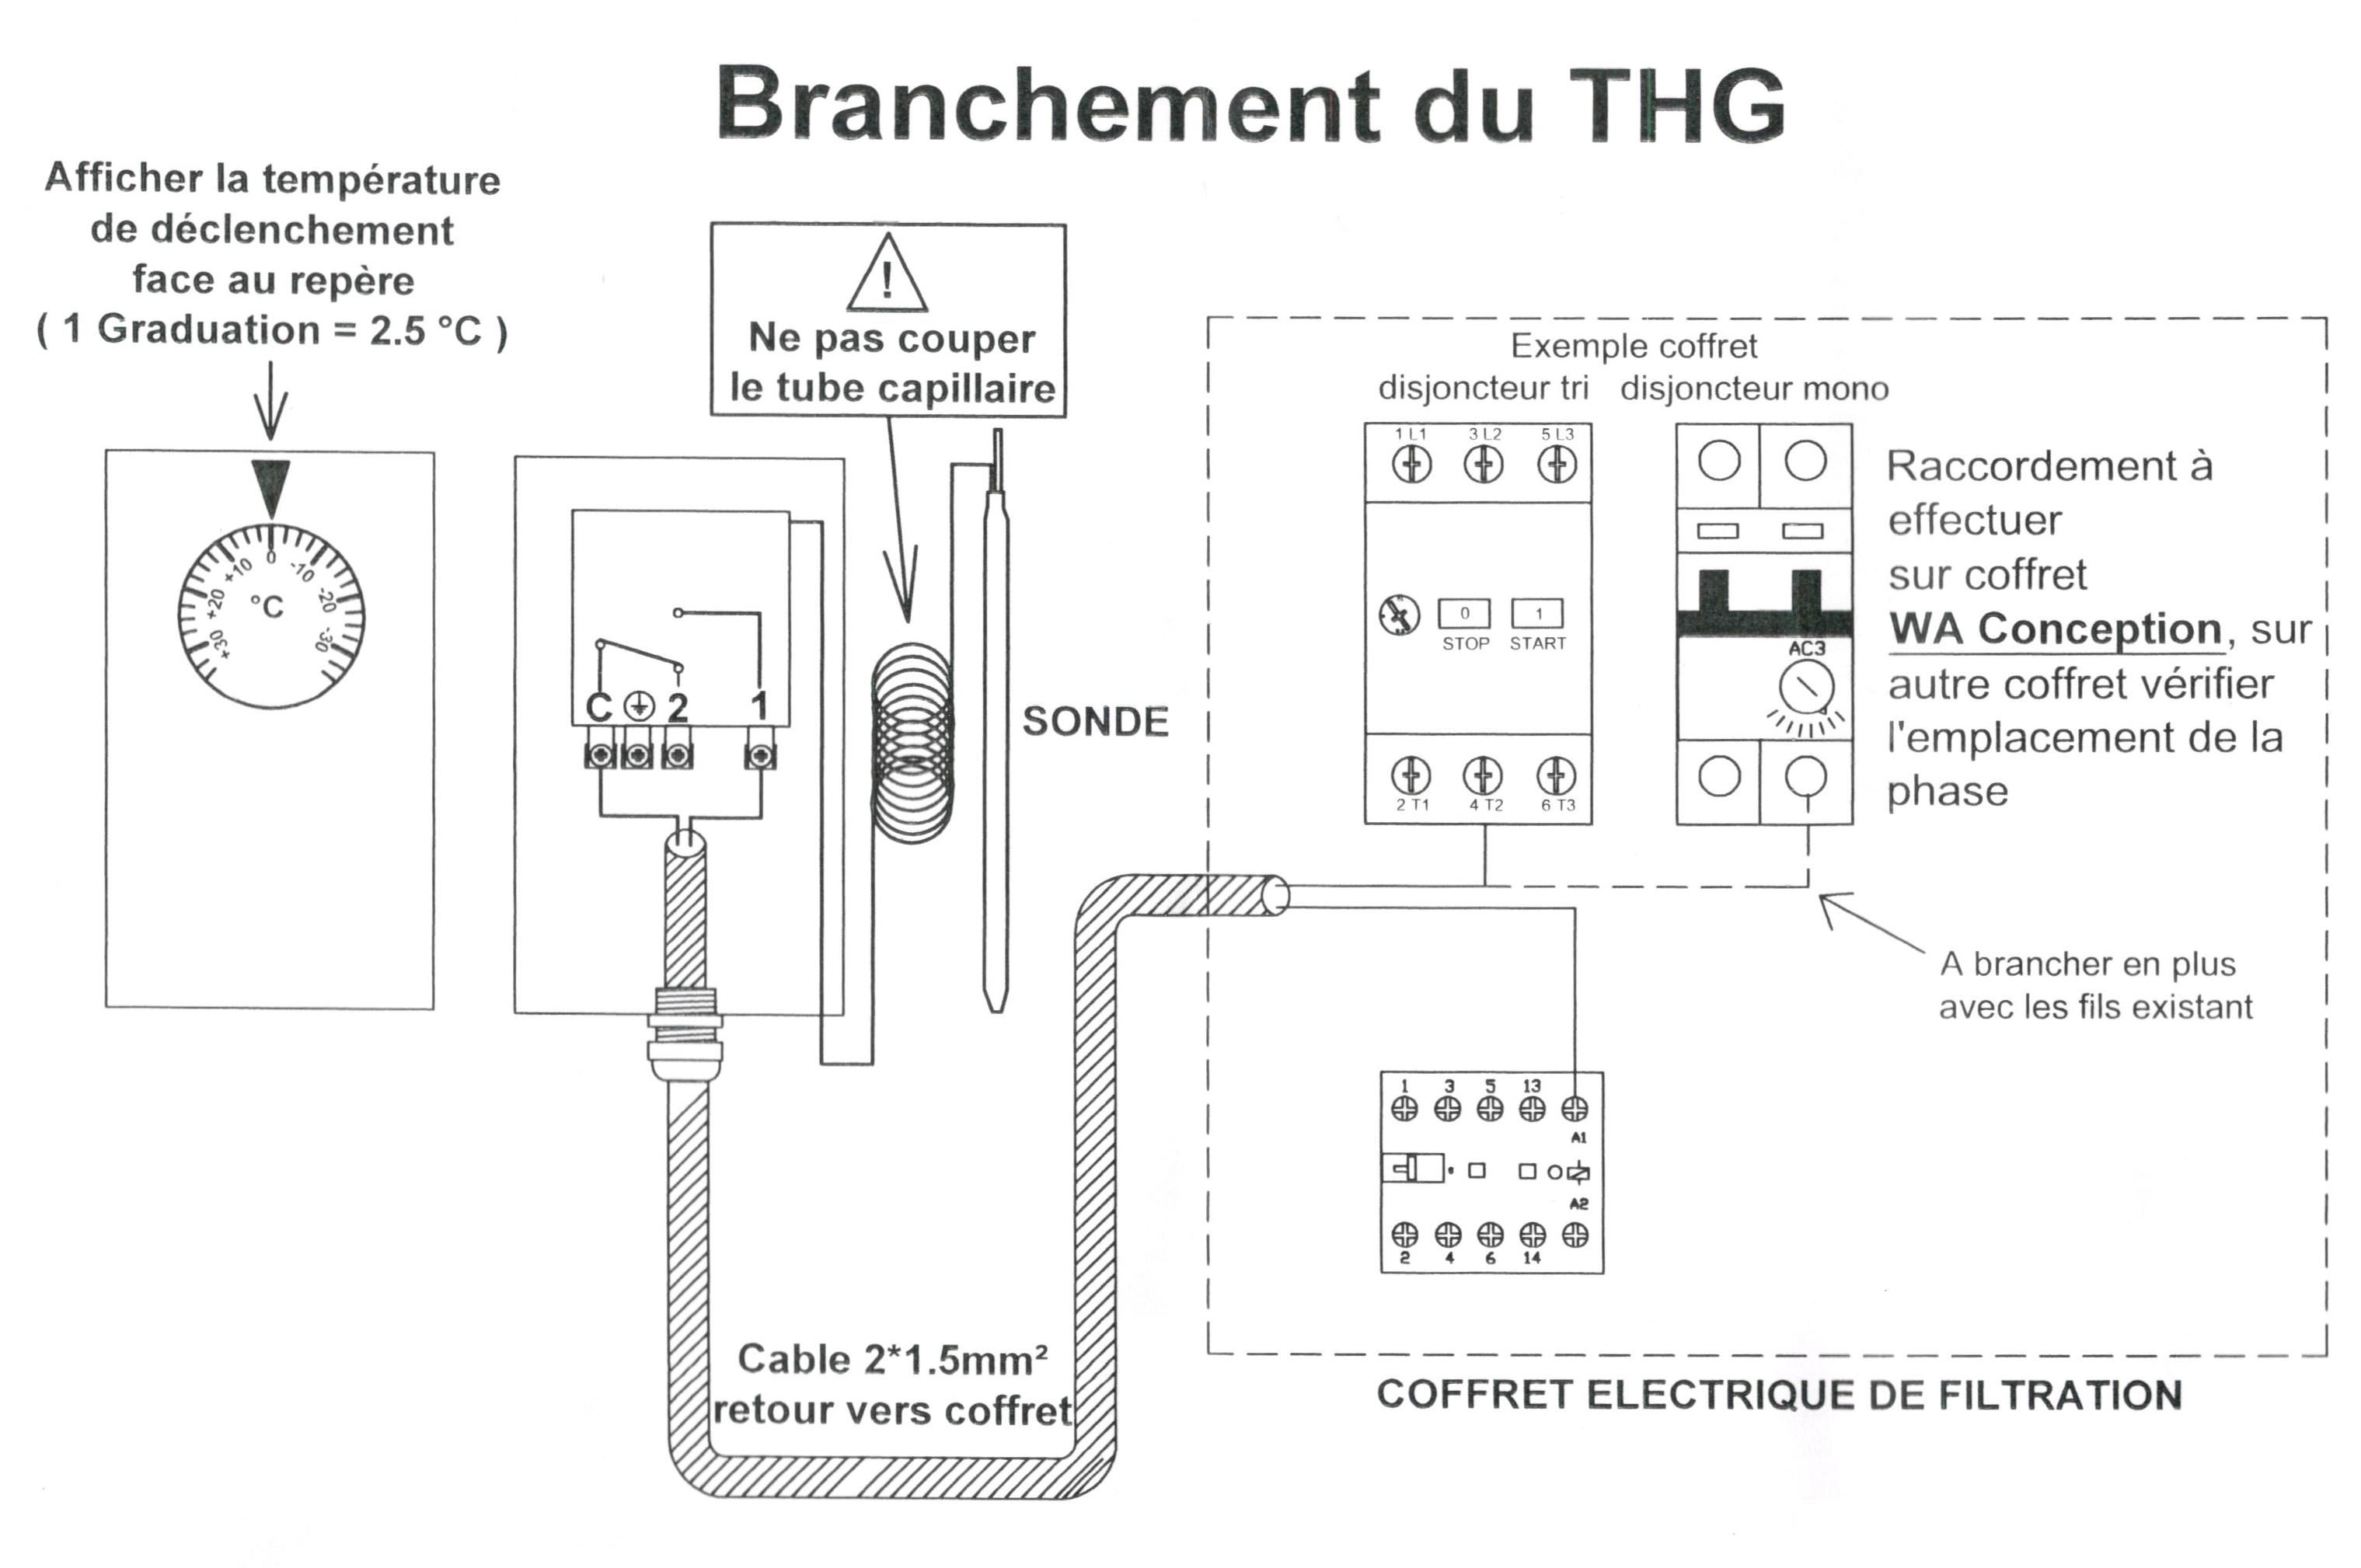 Thermostat hors gel mécanique THG